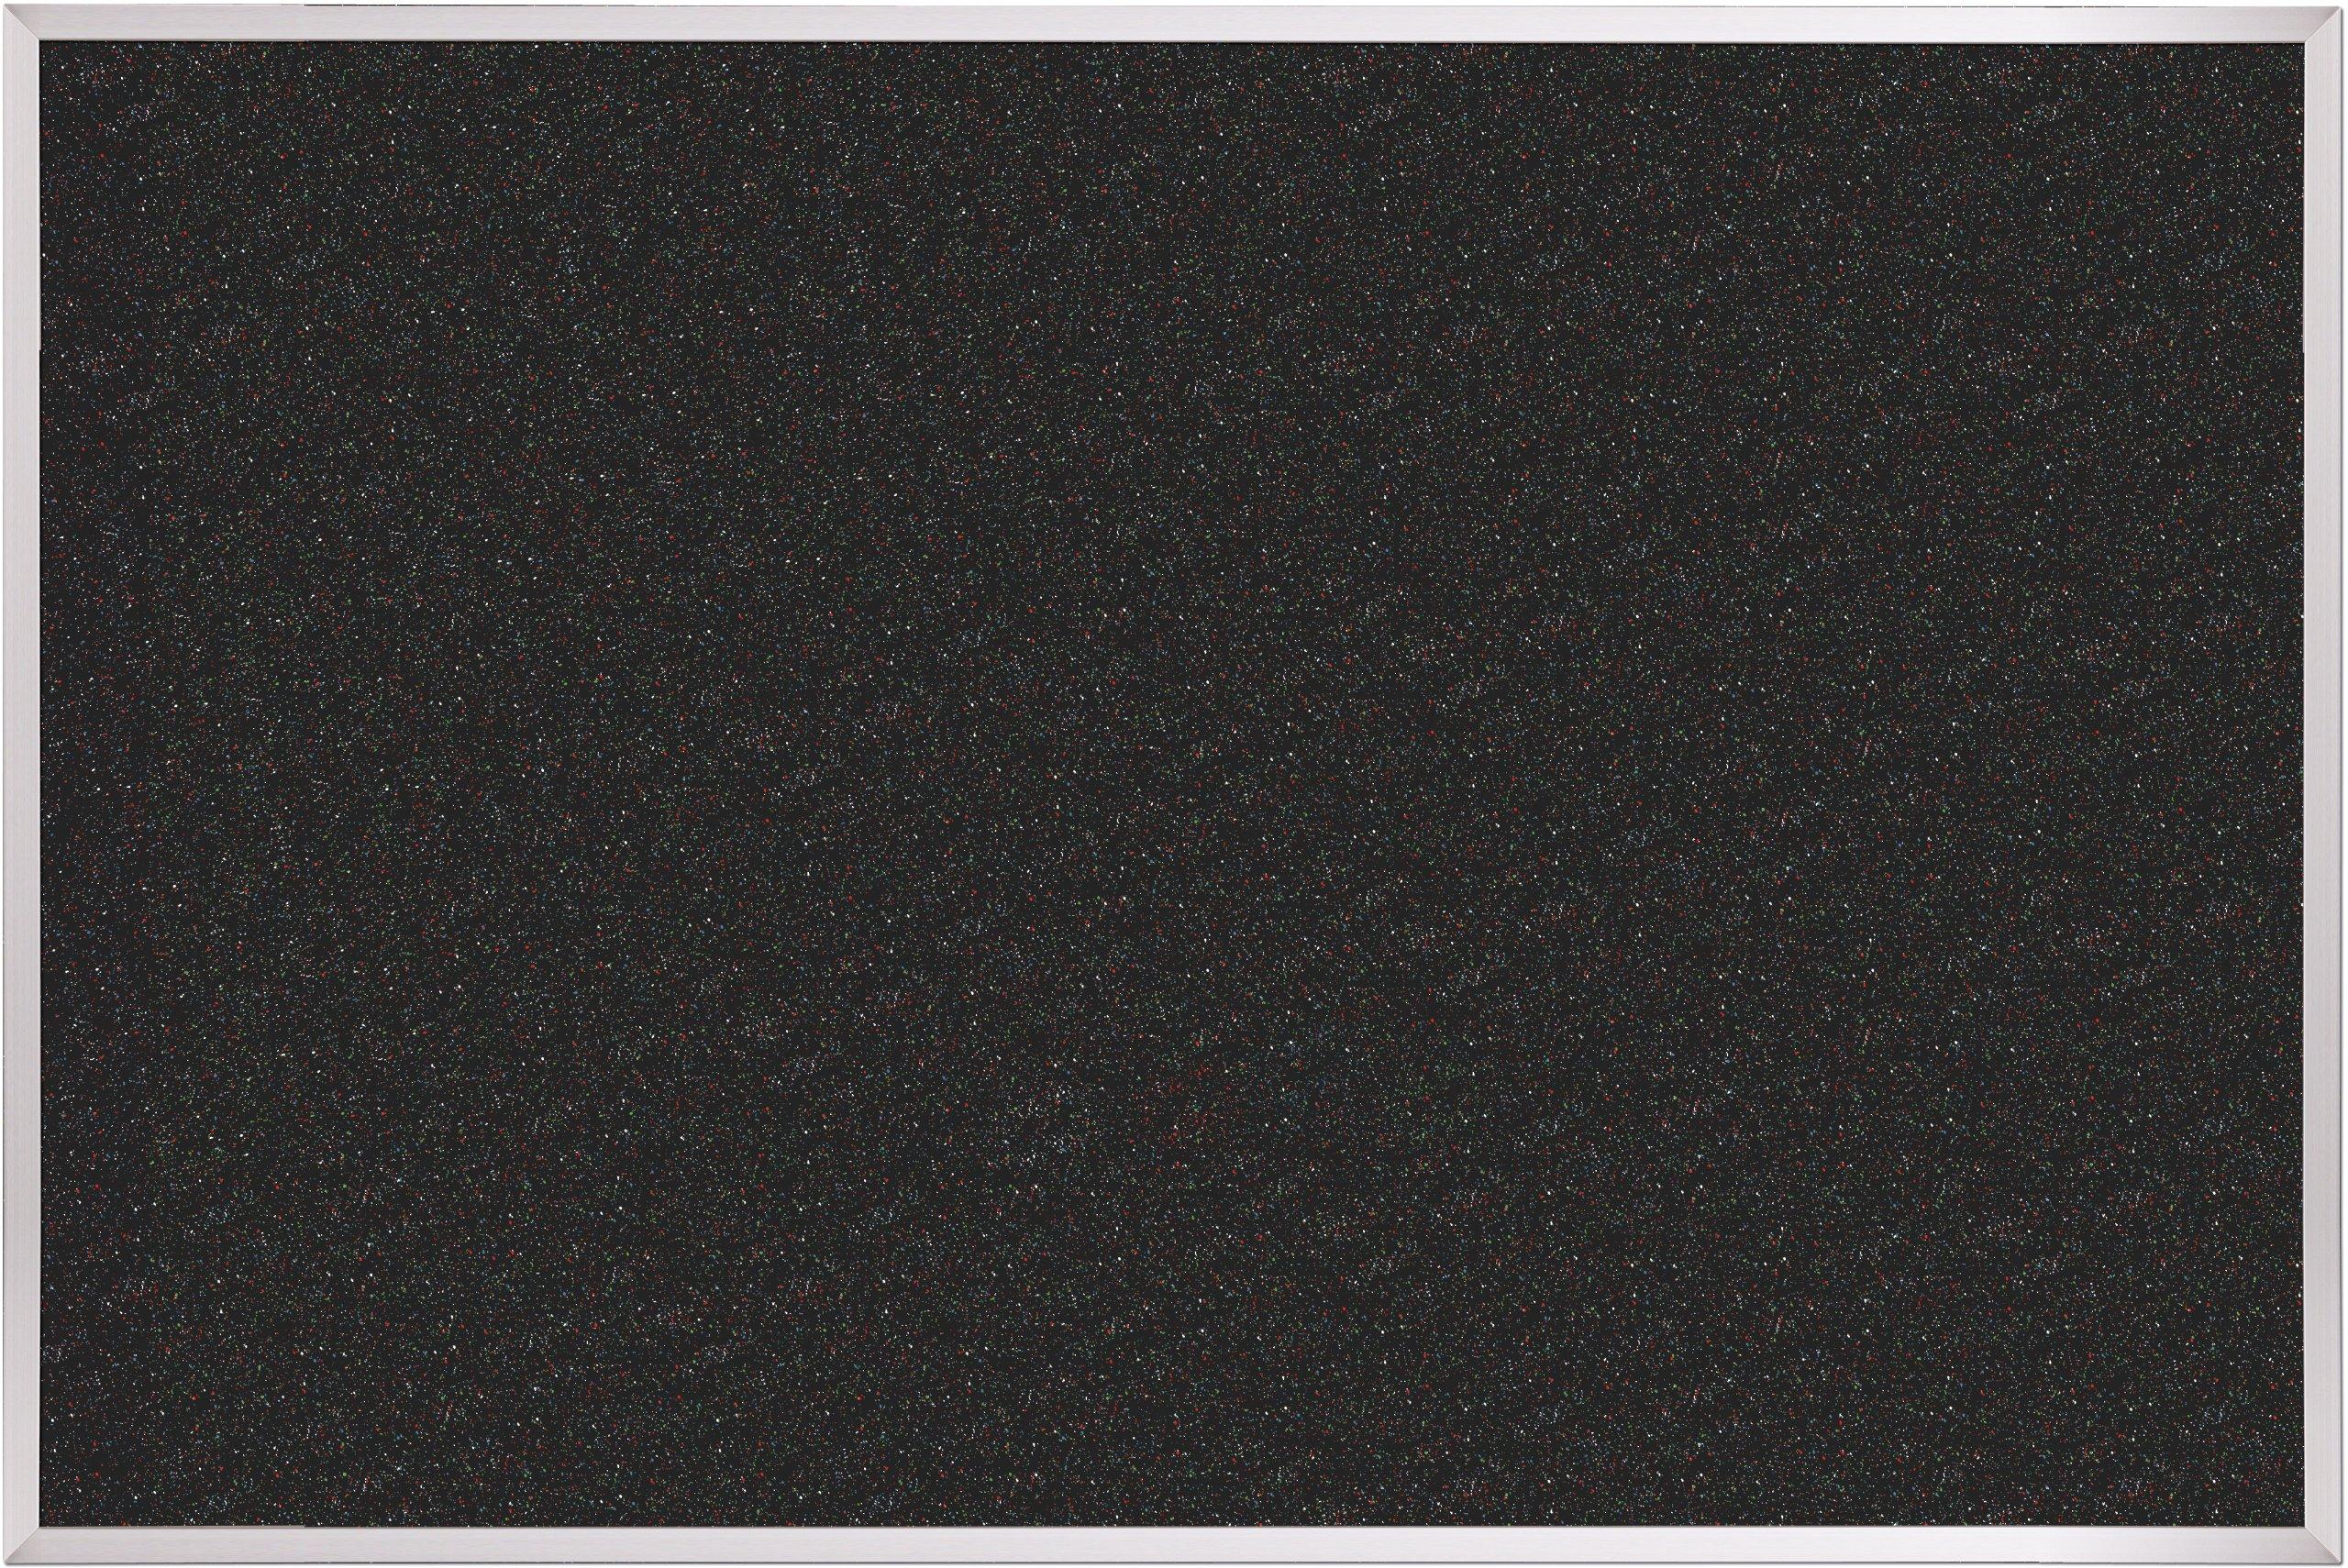 Best-Rite ReTire Rubber-Tak Tackboard, Aluminum Trim, 4 x 8 Feet (320AH-105)